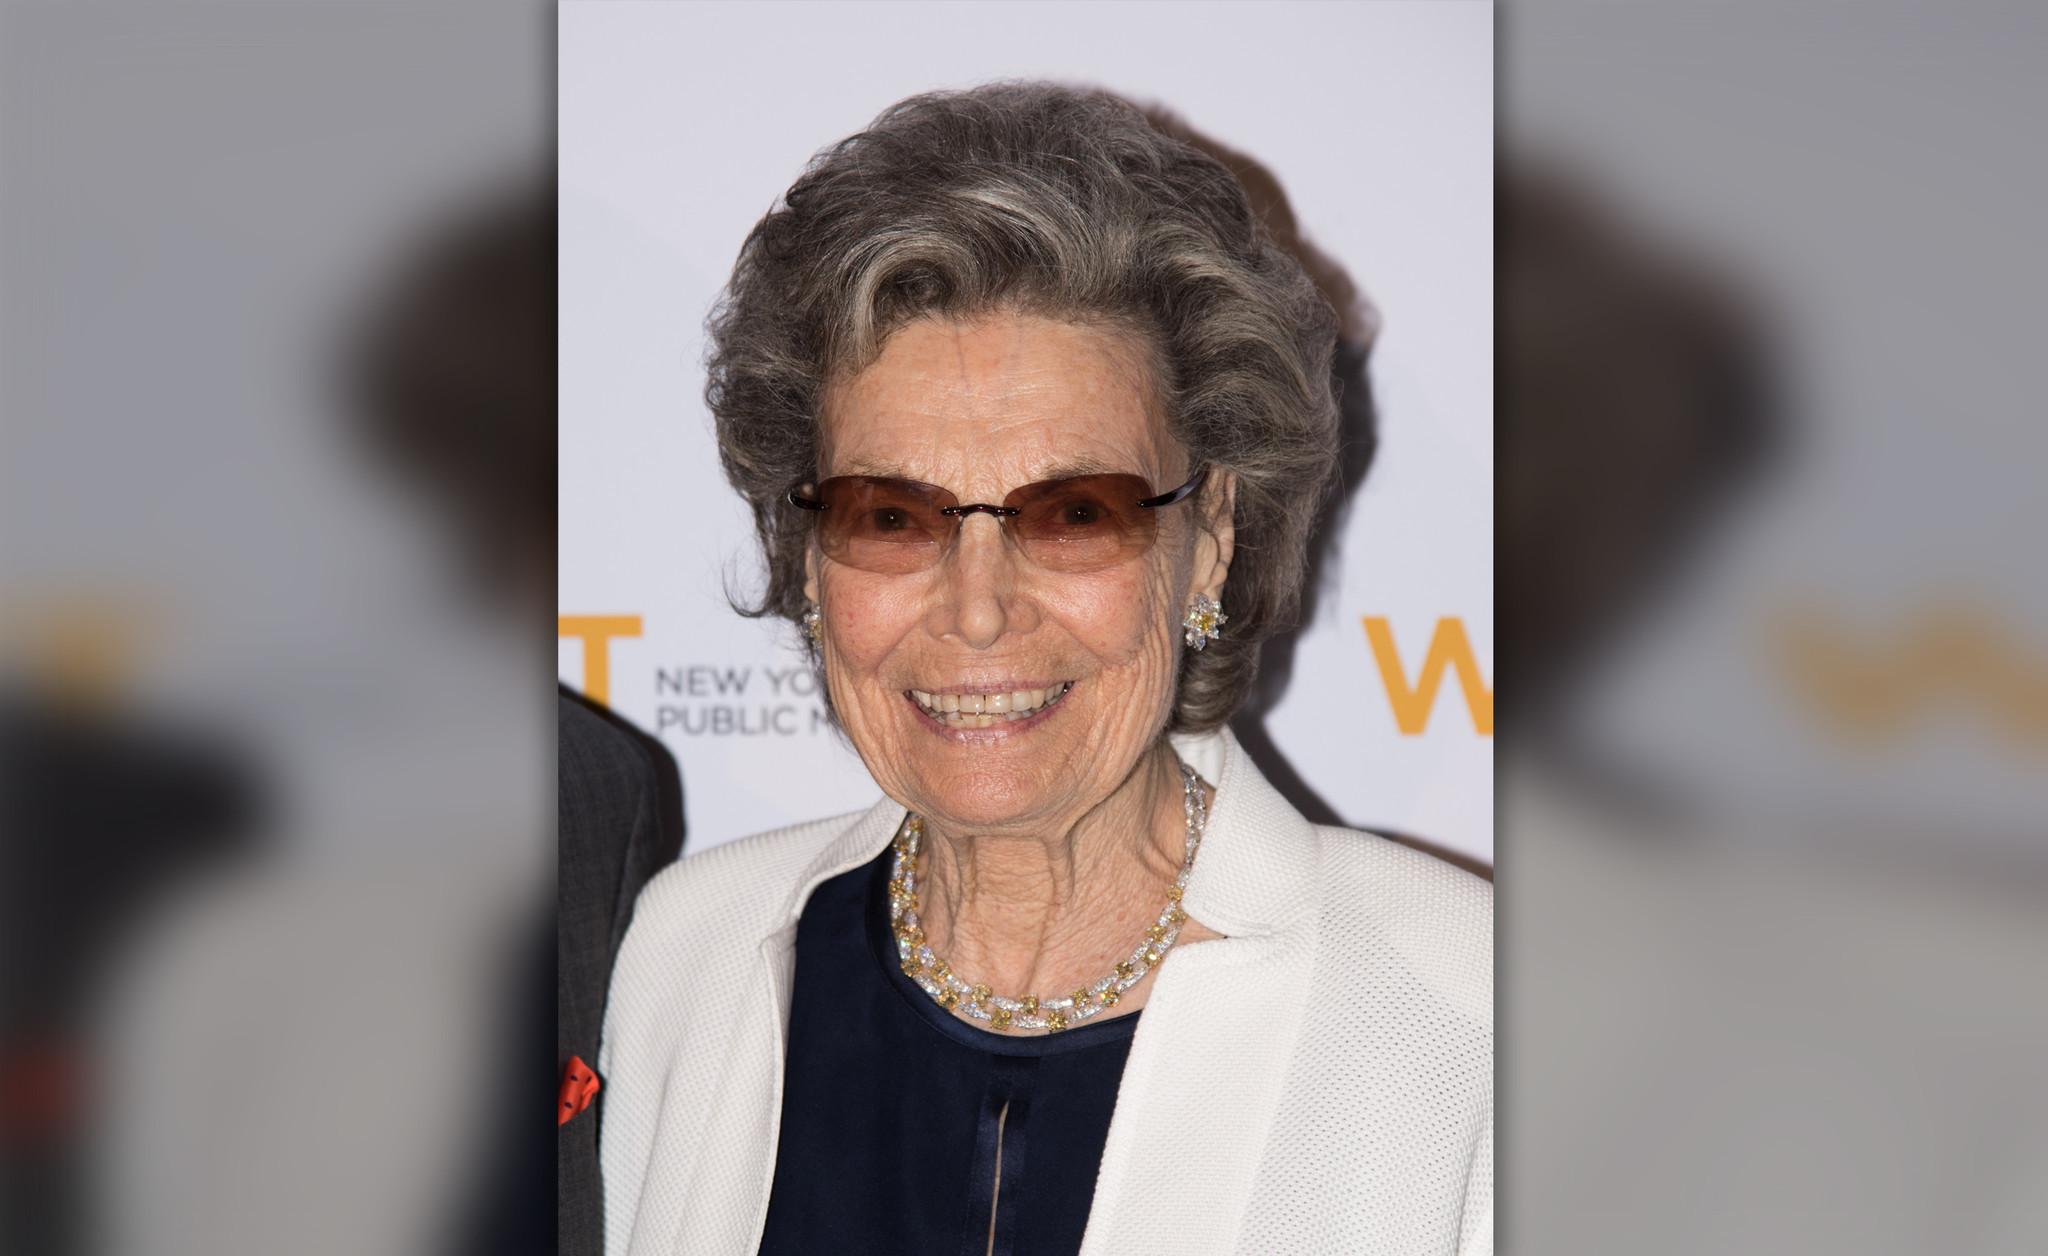 Rosalind P. Walter, aka Rosie the Riveter, has died at 95